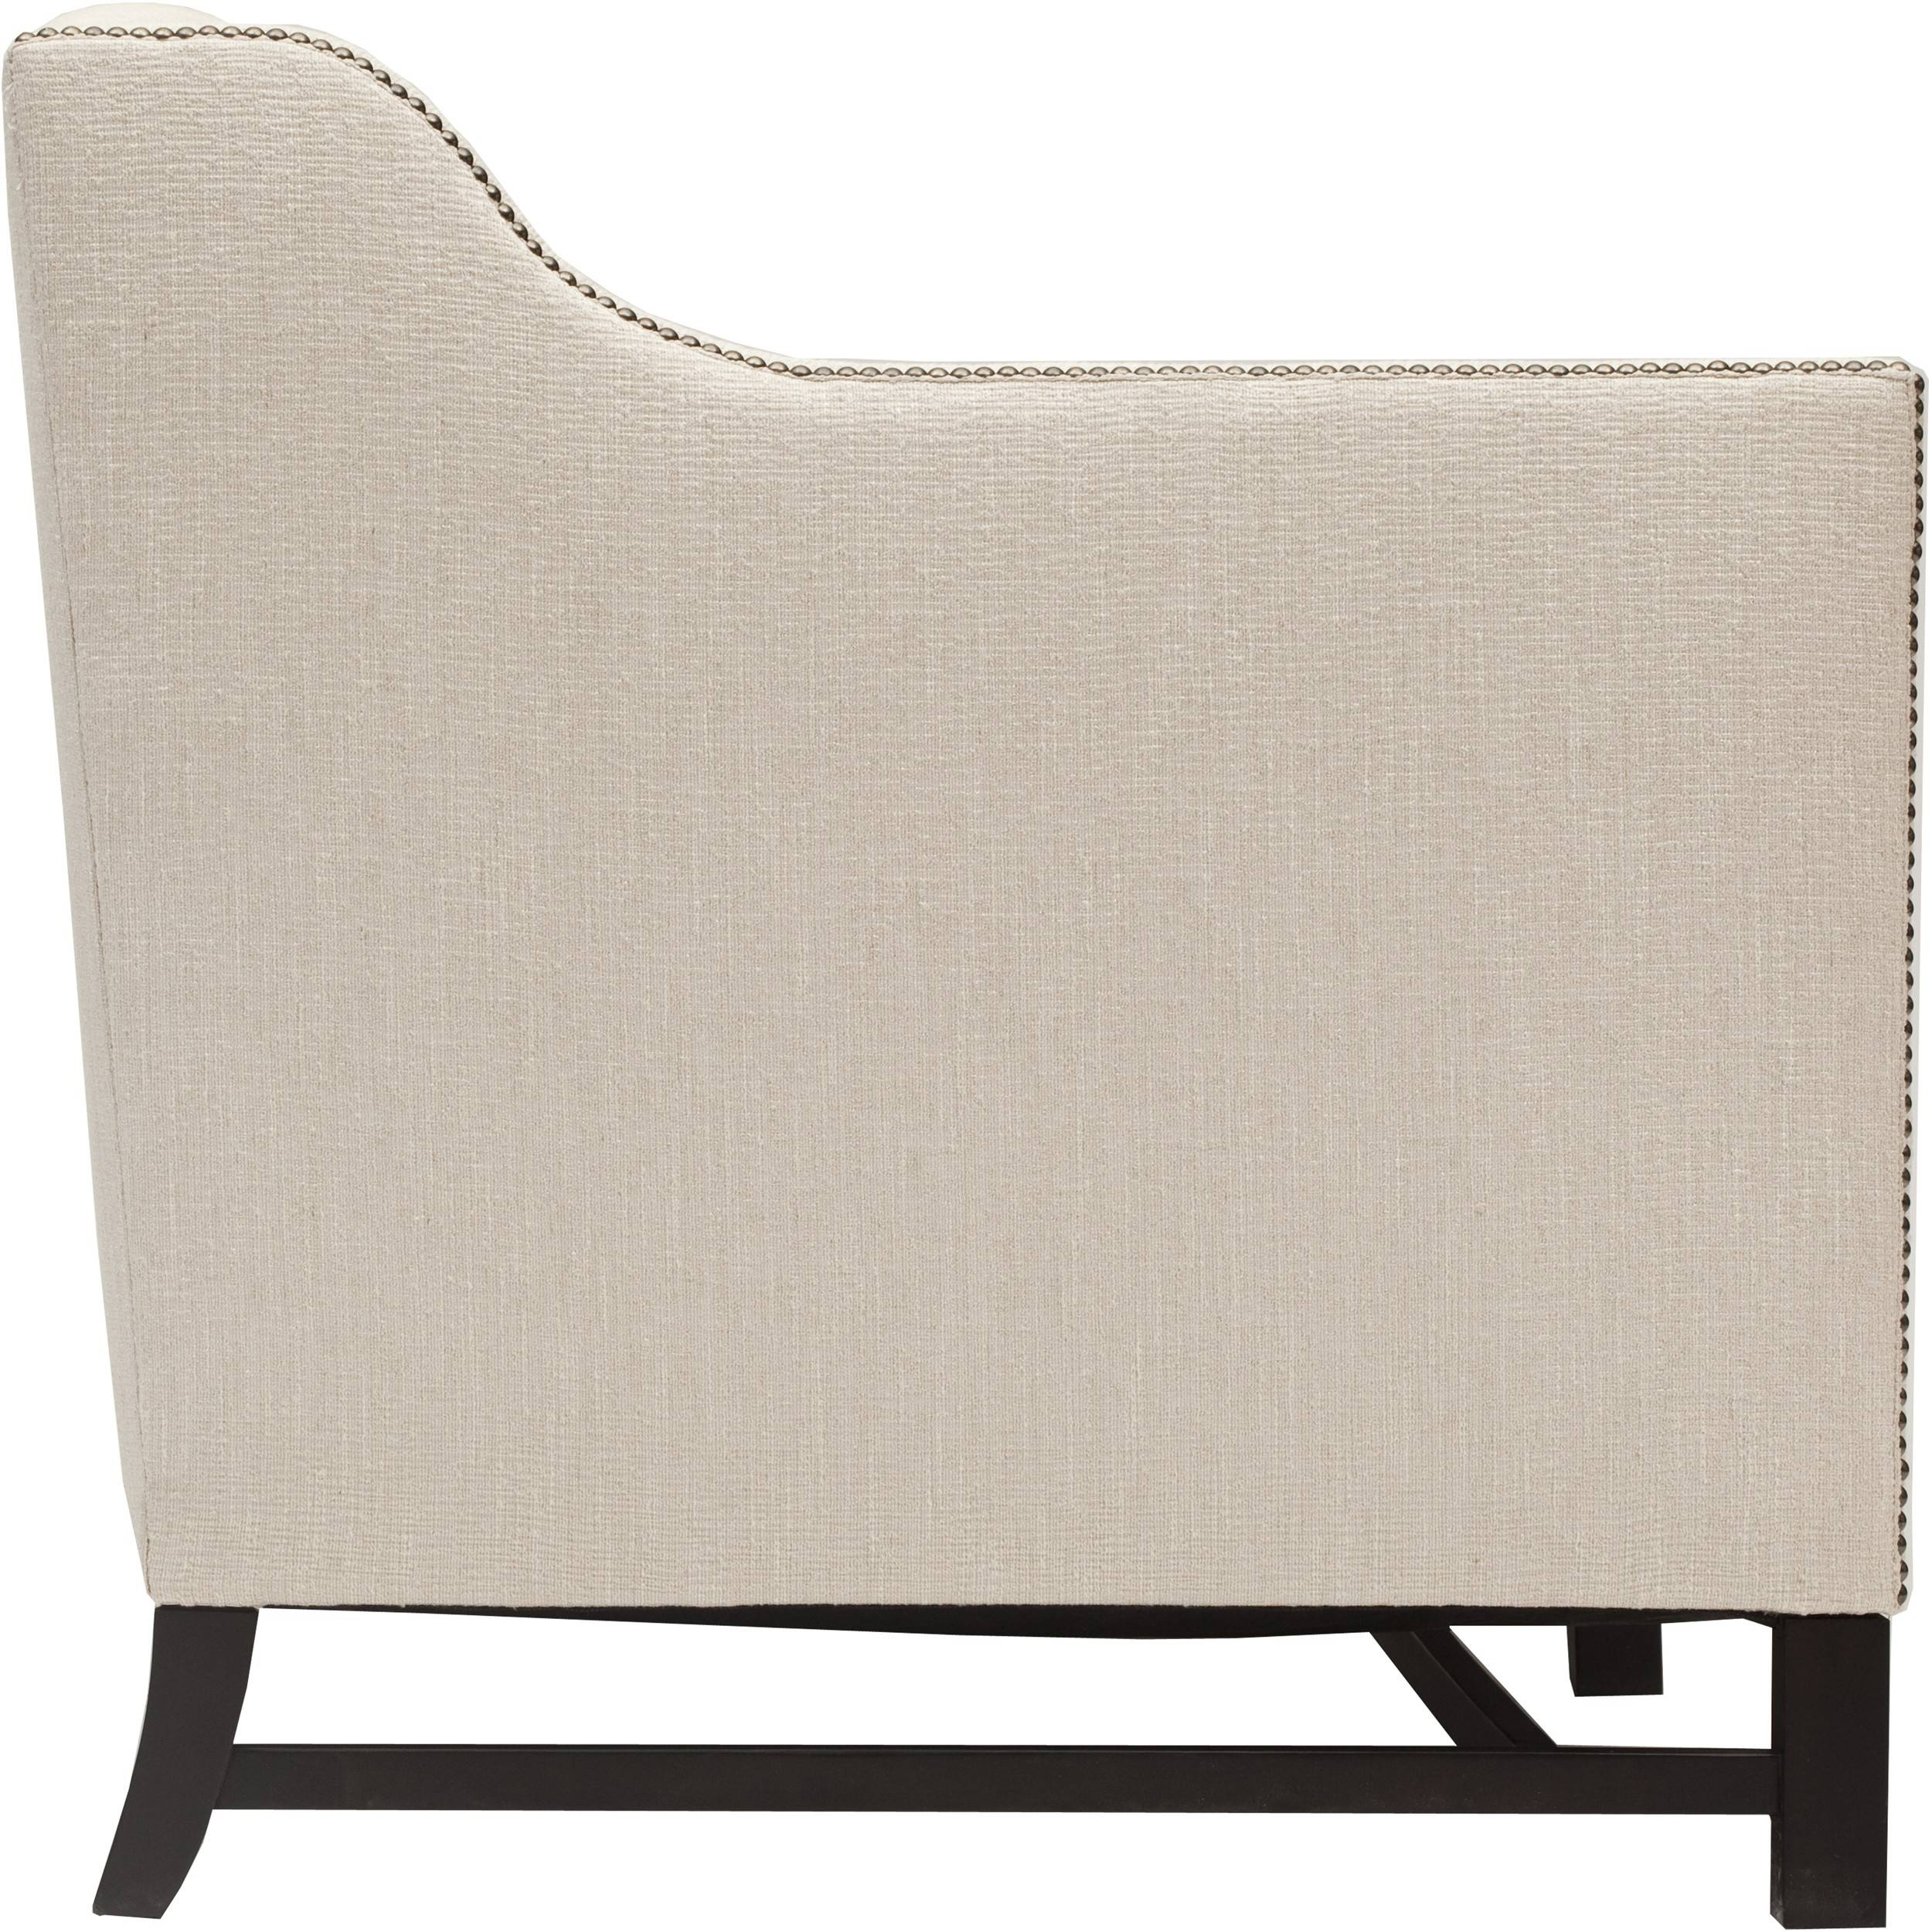 Chatham Sofa, Cream - Fabric - Sofas - Furniture in Fabric Sofas (Image 3 of 30)